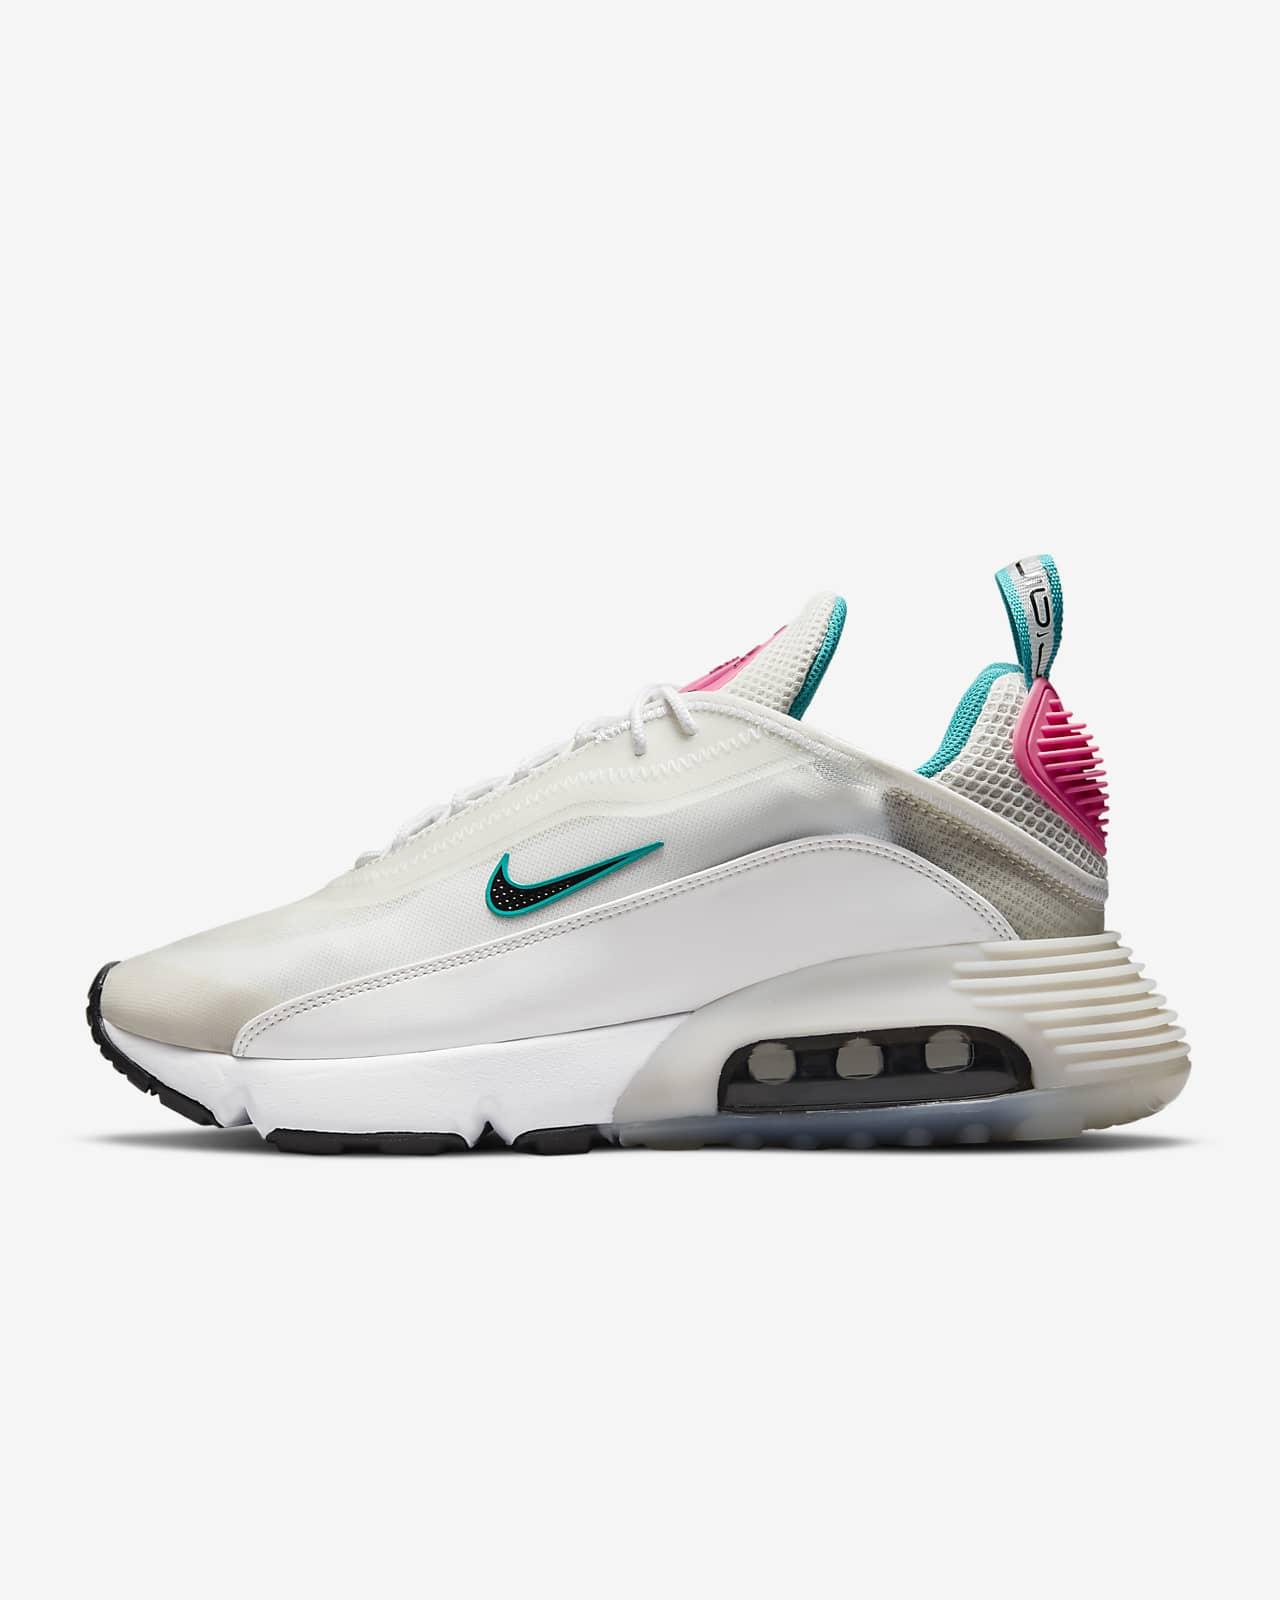 Nike Air Max 2090 SE 女子运动鞋